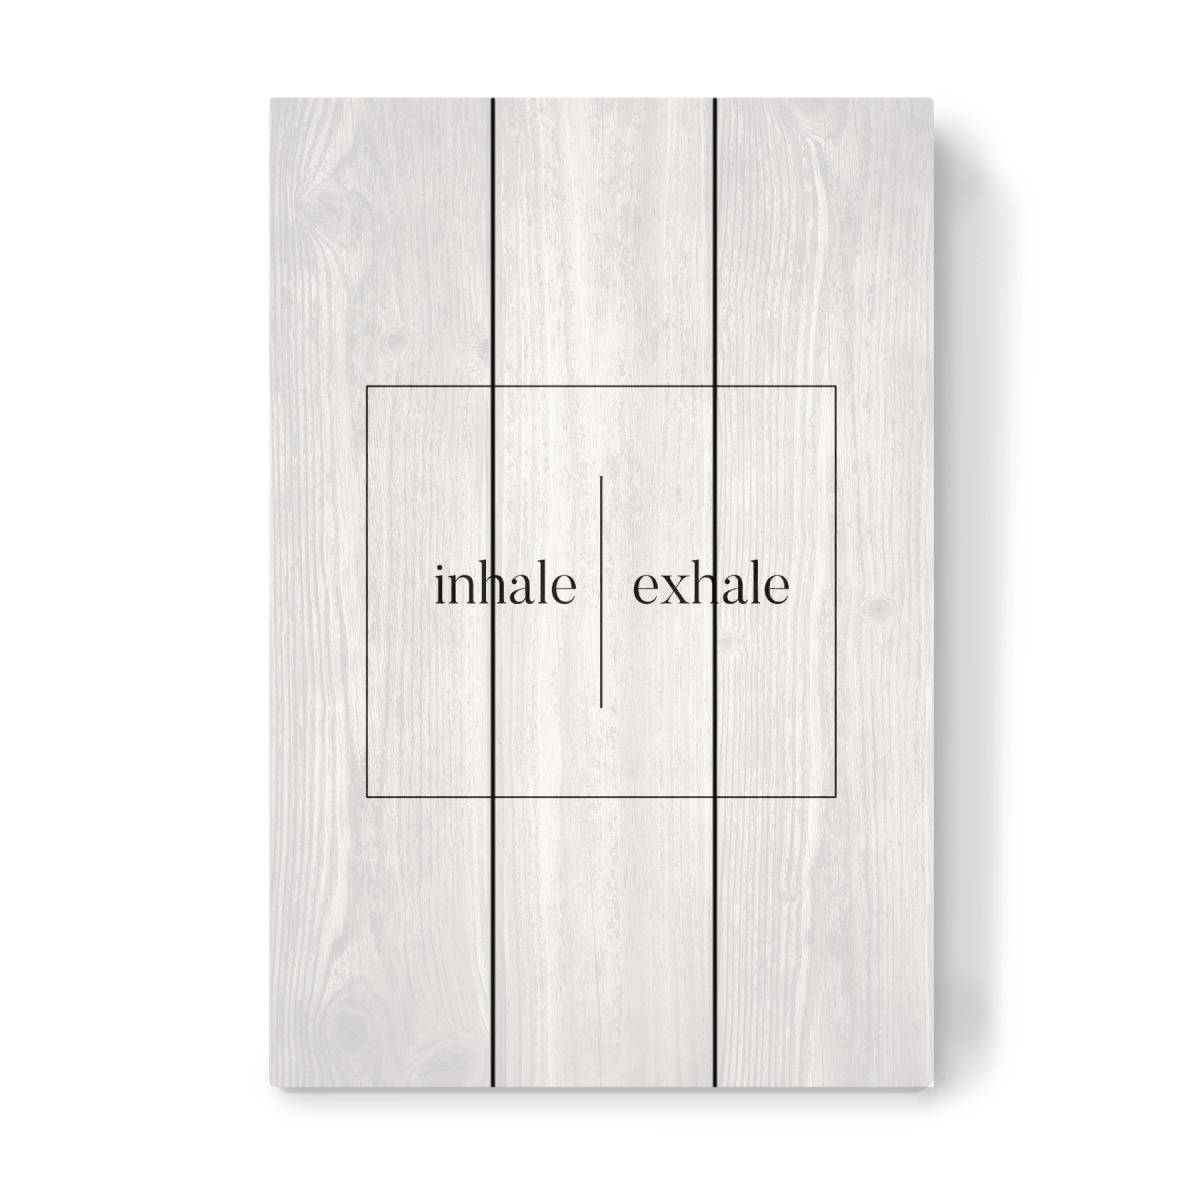 Inhale Exhale Als Holzbild Bei Artboxone Kaufen Inhalation And Exhalation Diagram Image